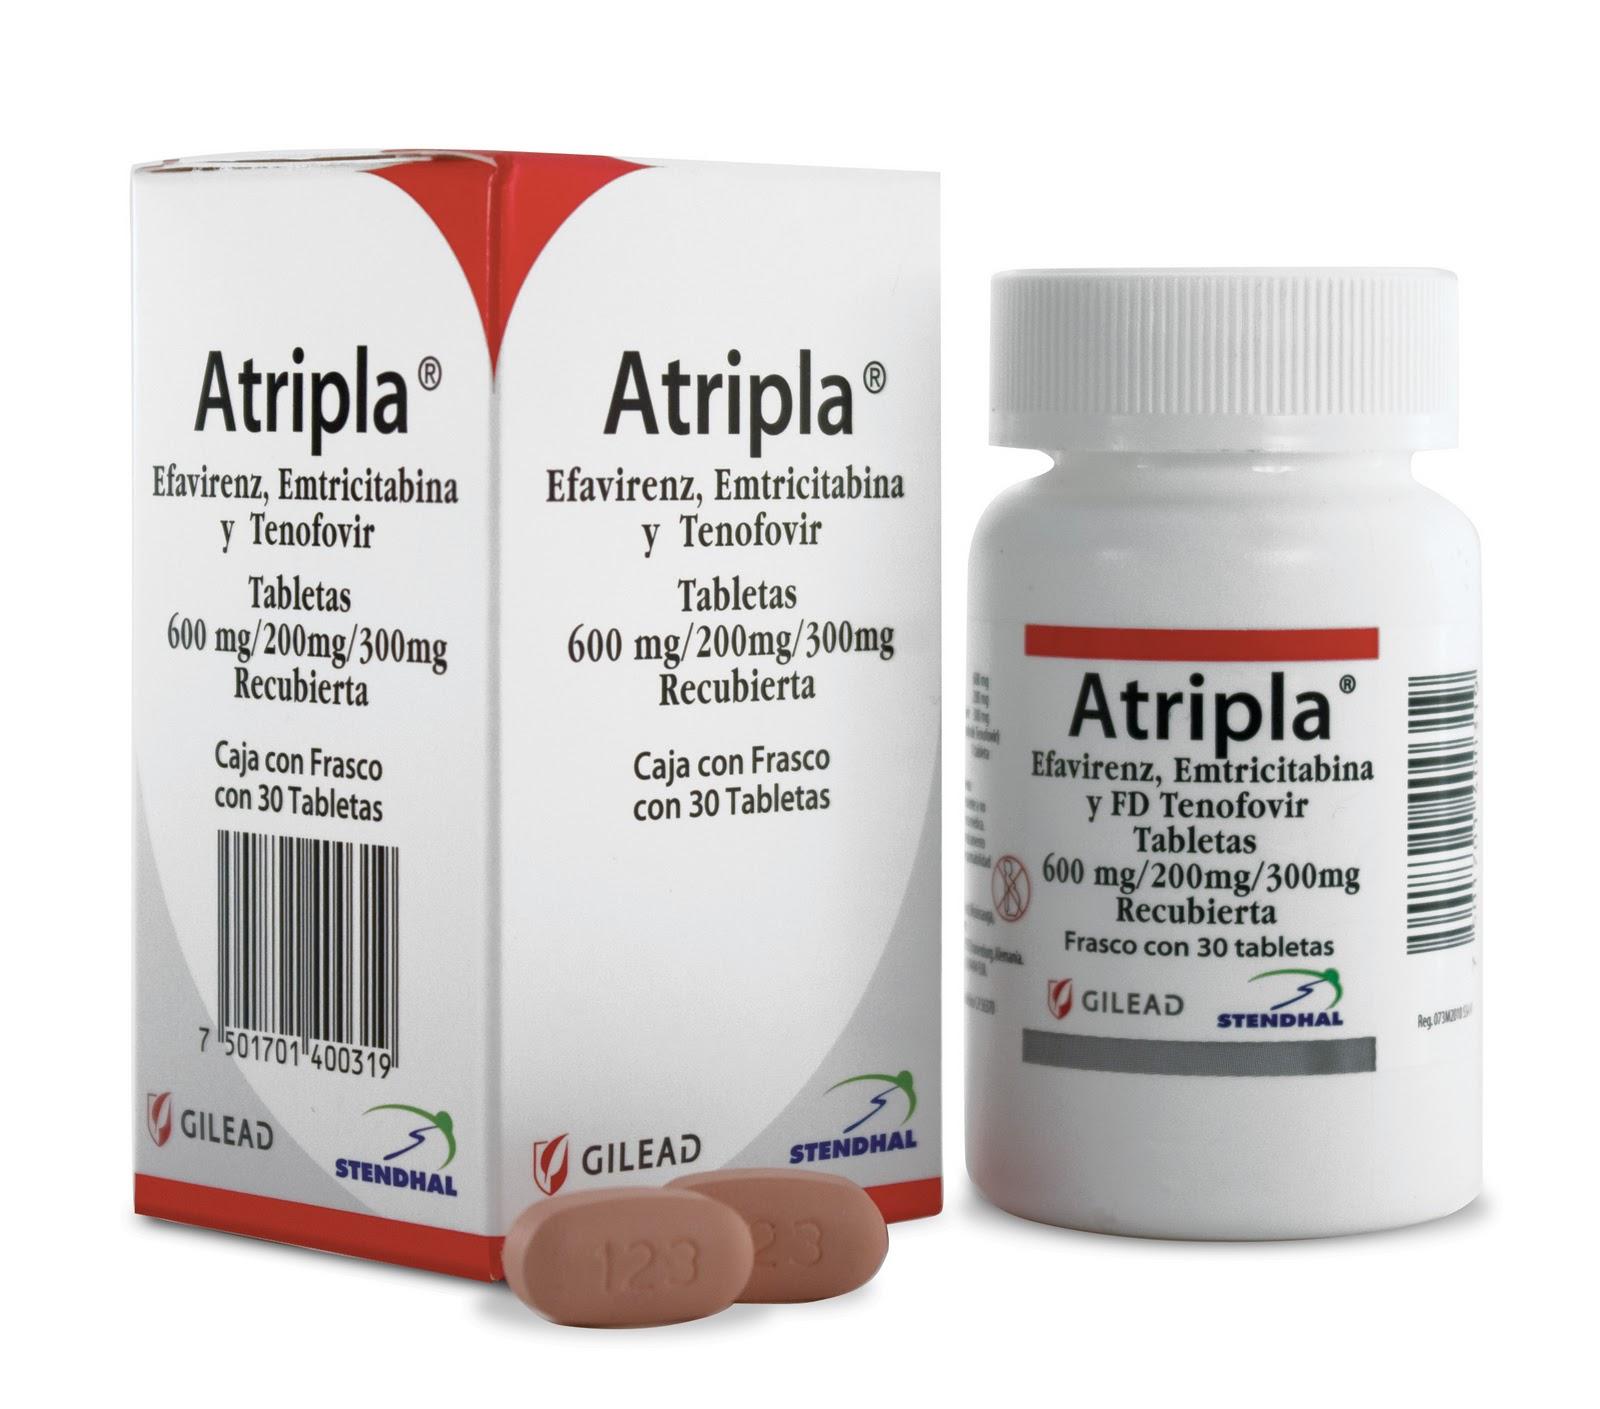 Neurontin 600 mg dosage